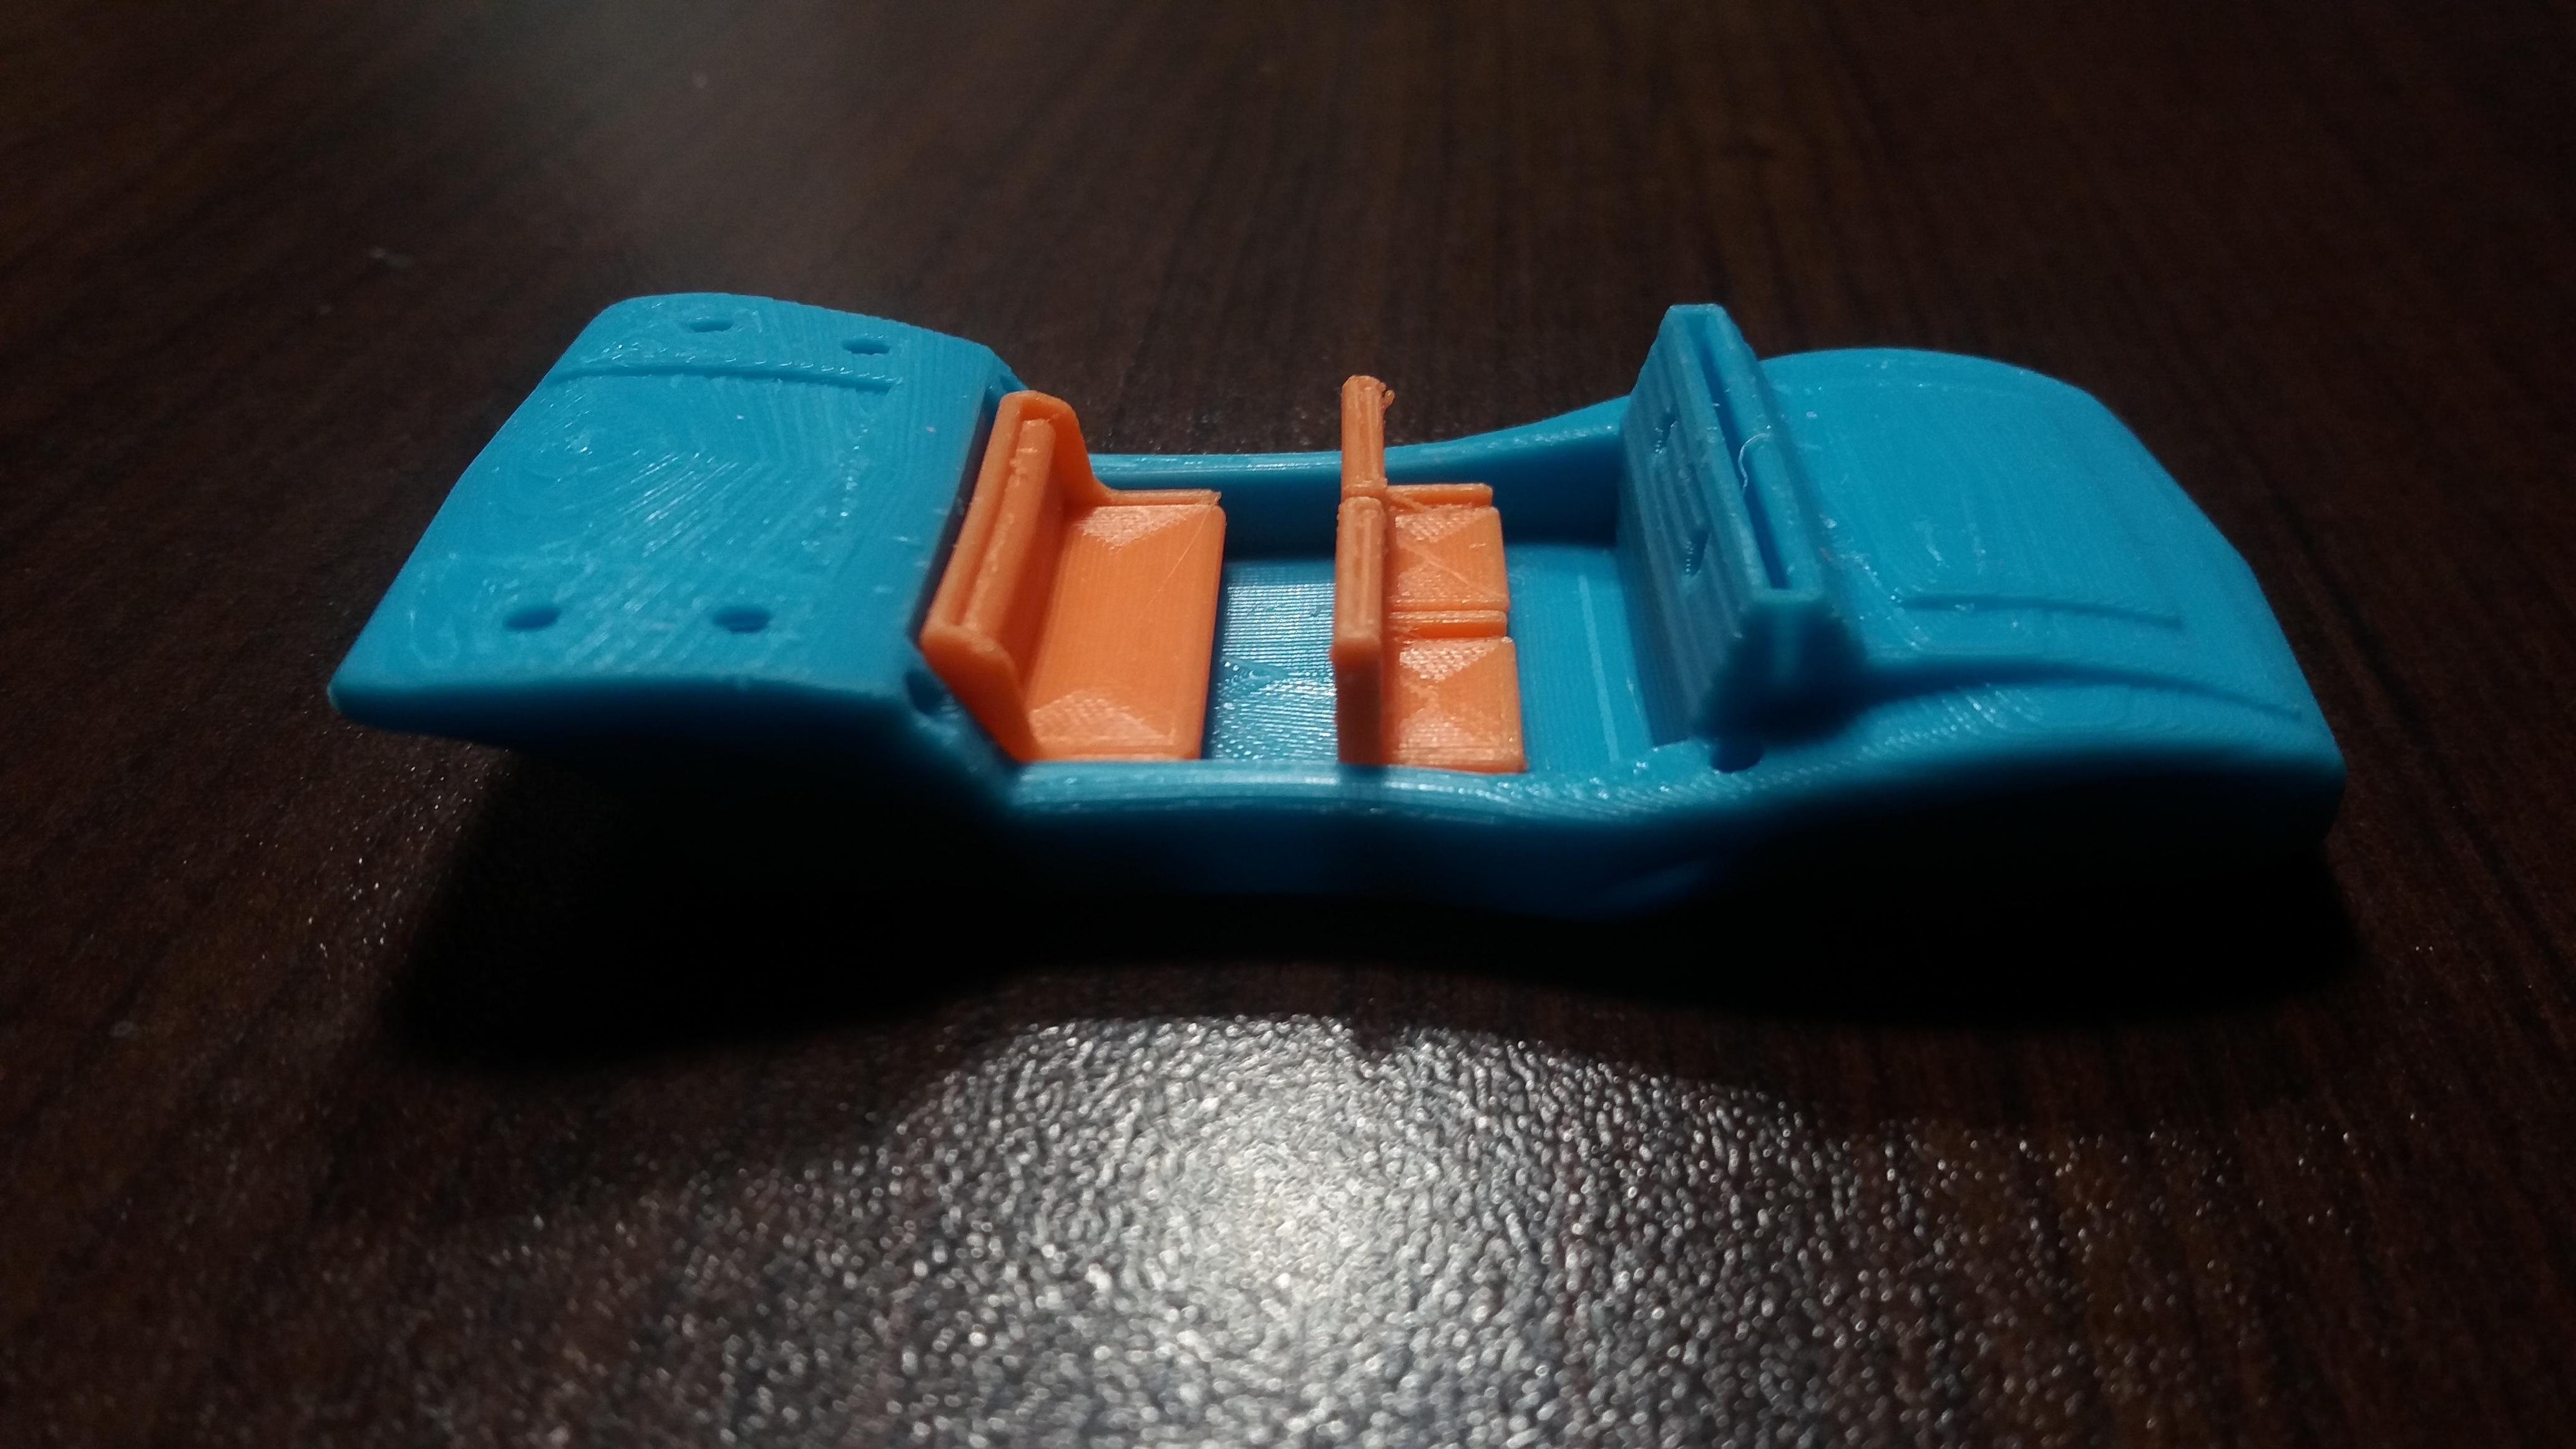 20180406_214421.jpg Télécharger fichier STL  Buggy,  • Plan imprimable en 3D, gerbat